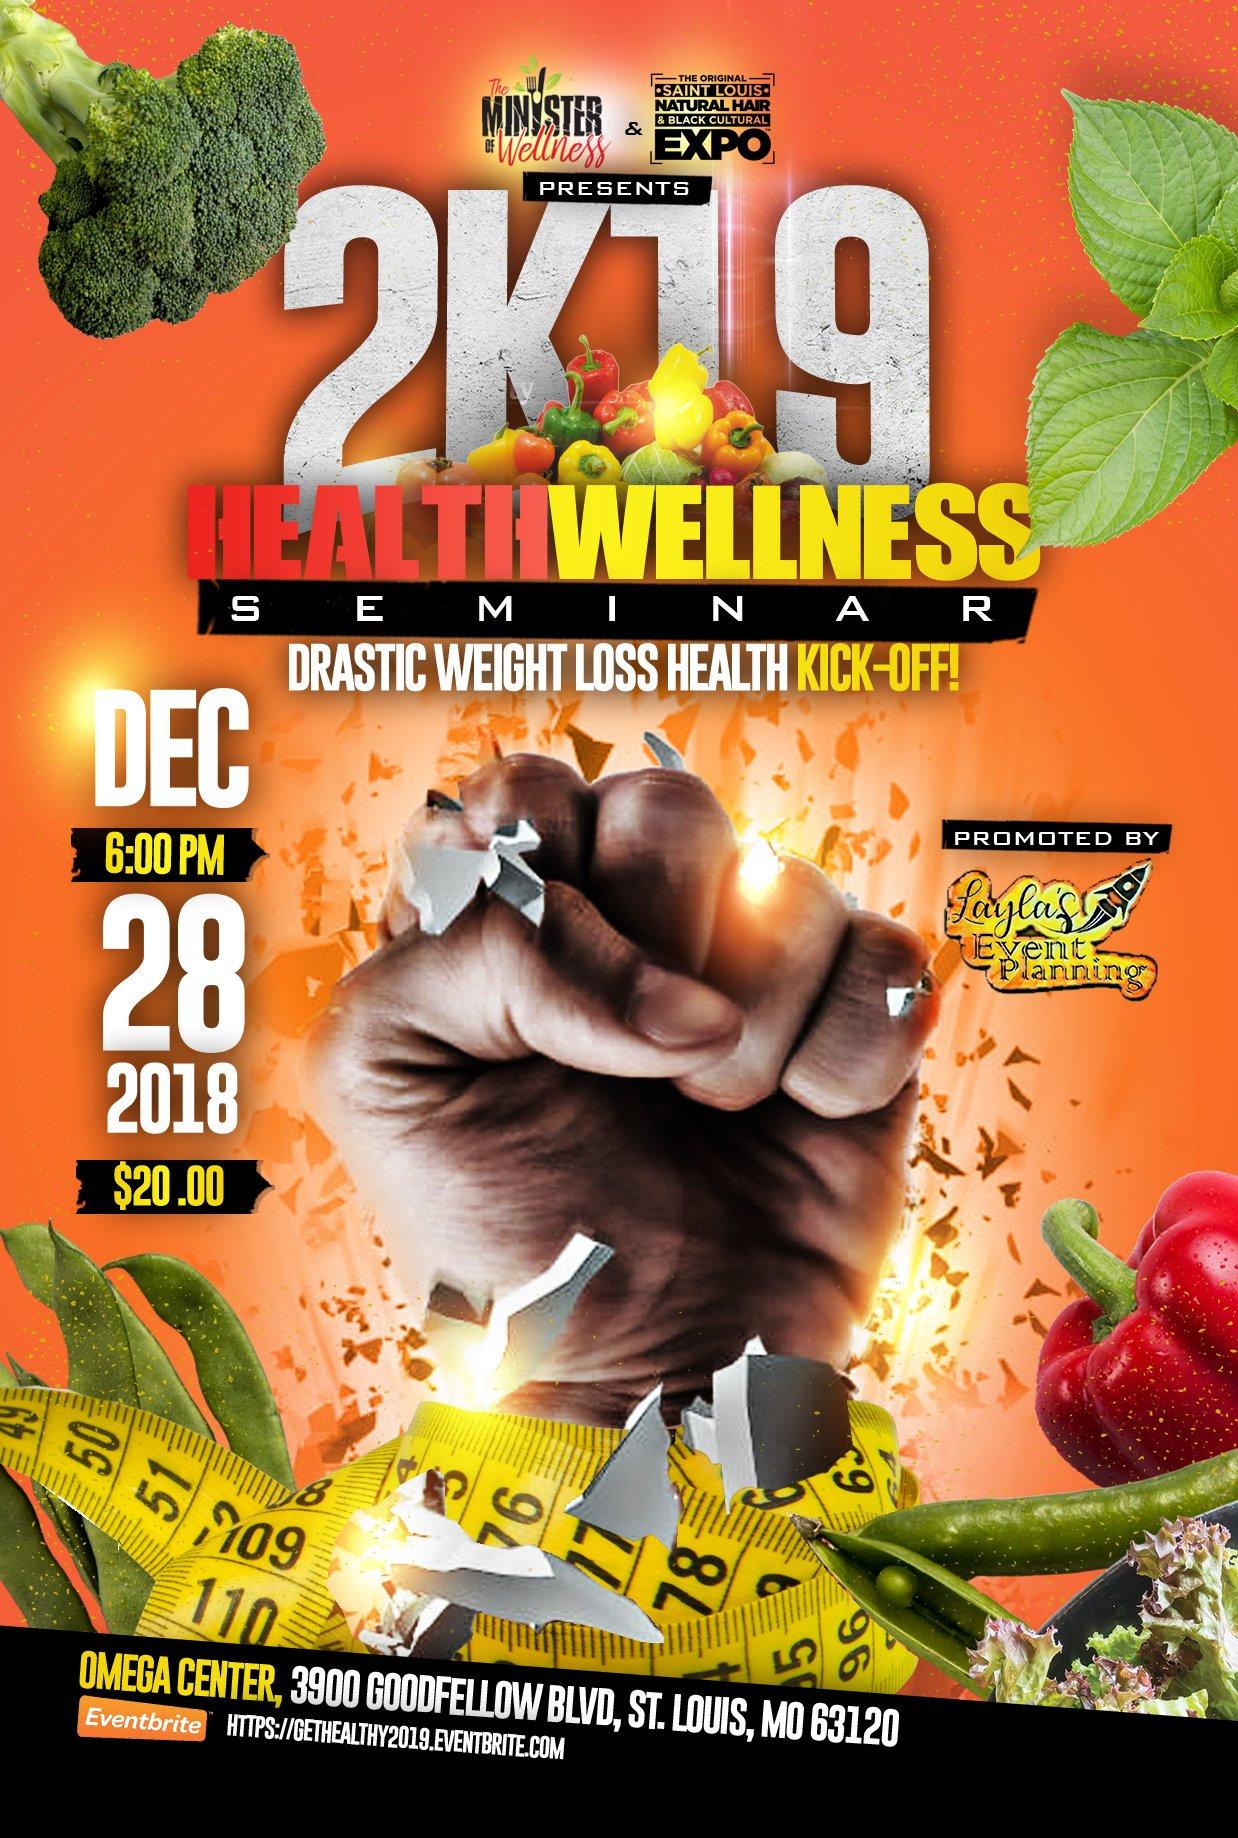 2k19 Health Wellness Seminar Drastic Weight Loss Kick Off The Minister Of Wellness